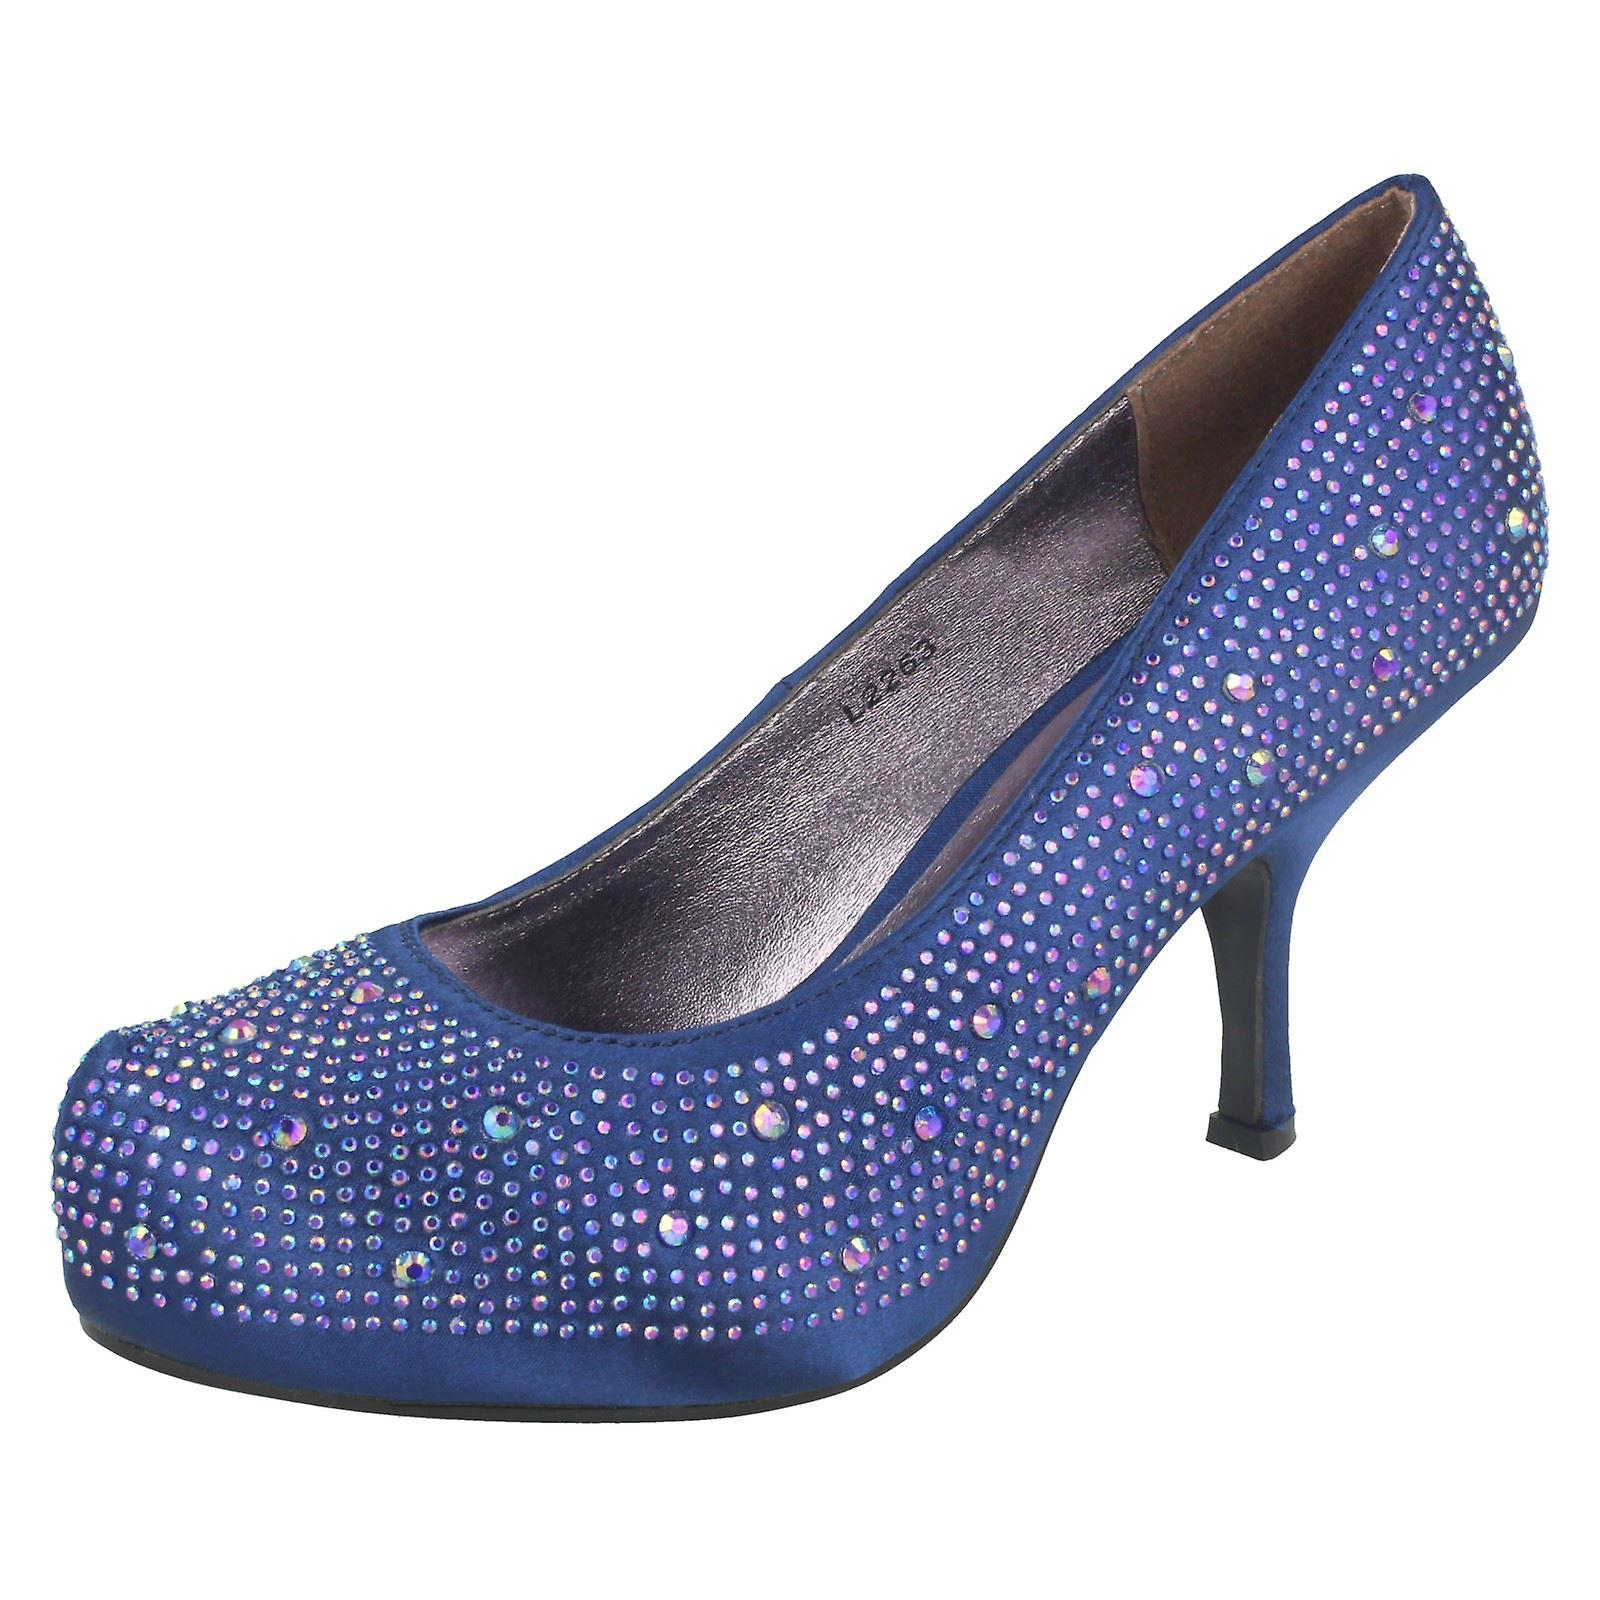 Ladies Anne Satin Michelle Satin Anne Beaded Court Shoes b87089